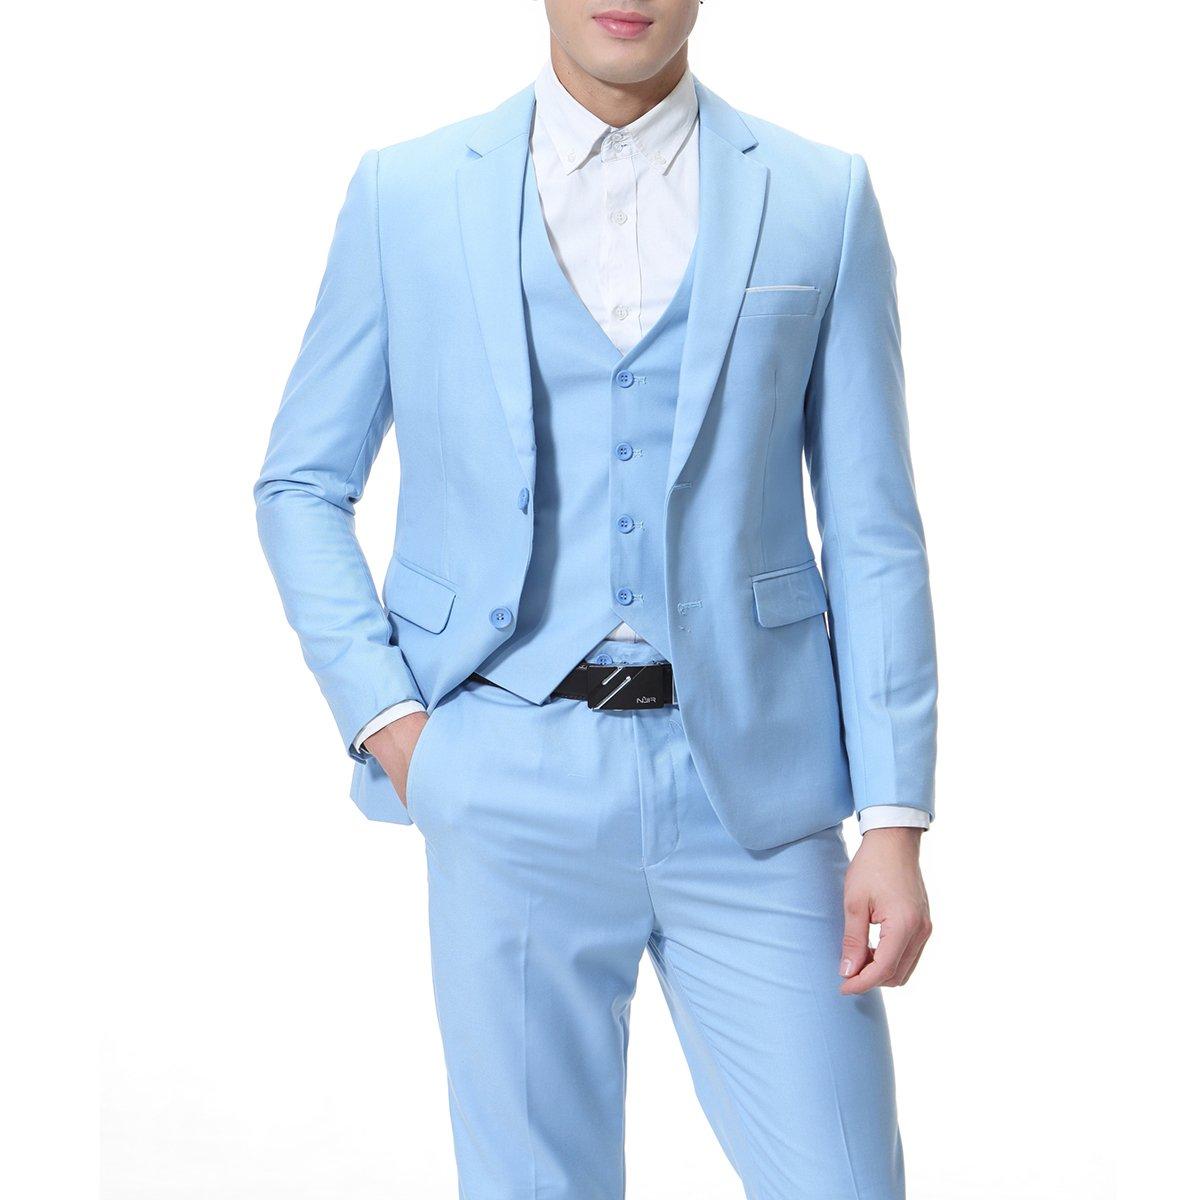 Mens Suits 3 Piece Reguler Slim Fit Wedding Tuexedo Suit for Men Business Casual Wedding Suits Jacket Blazer Waistcoat Trousers